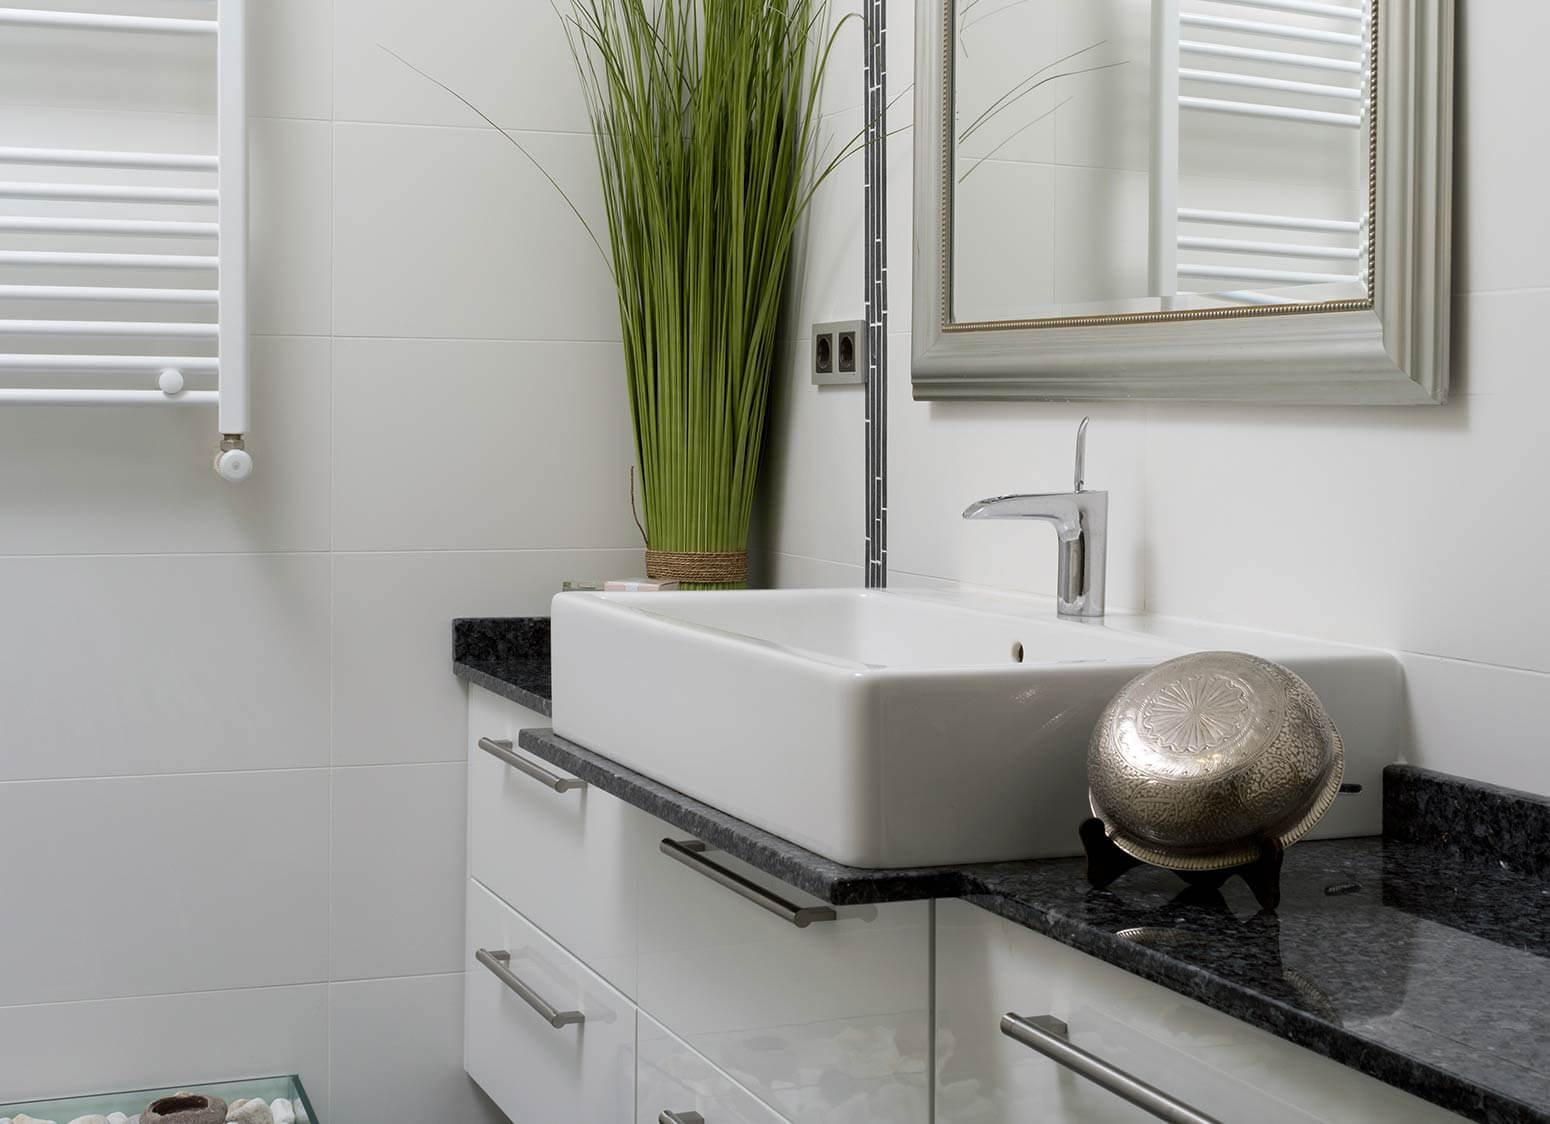 Bathroom Taps Scunthorpe Bathroom Sinks Quality